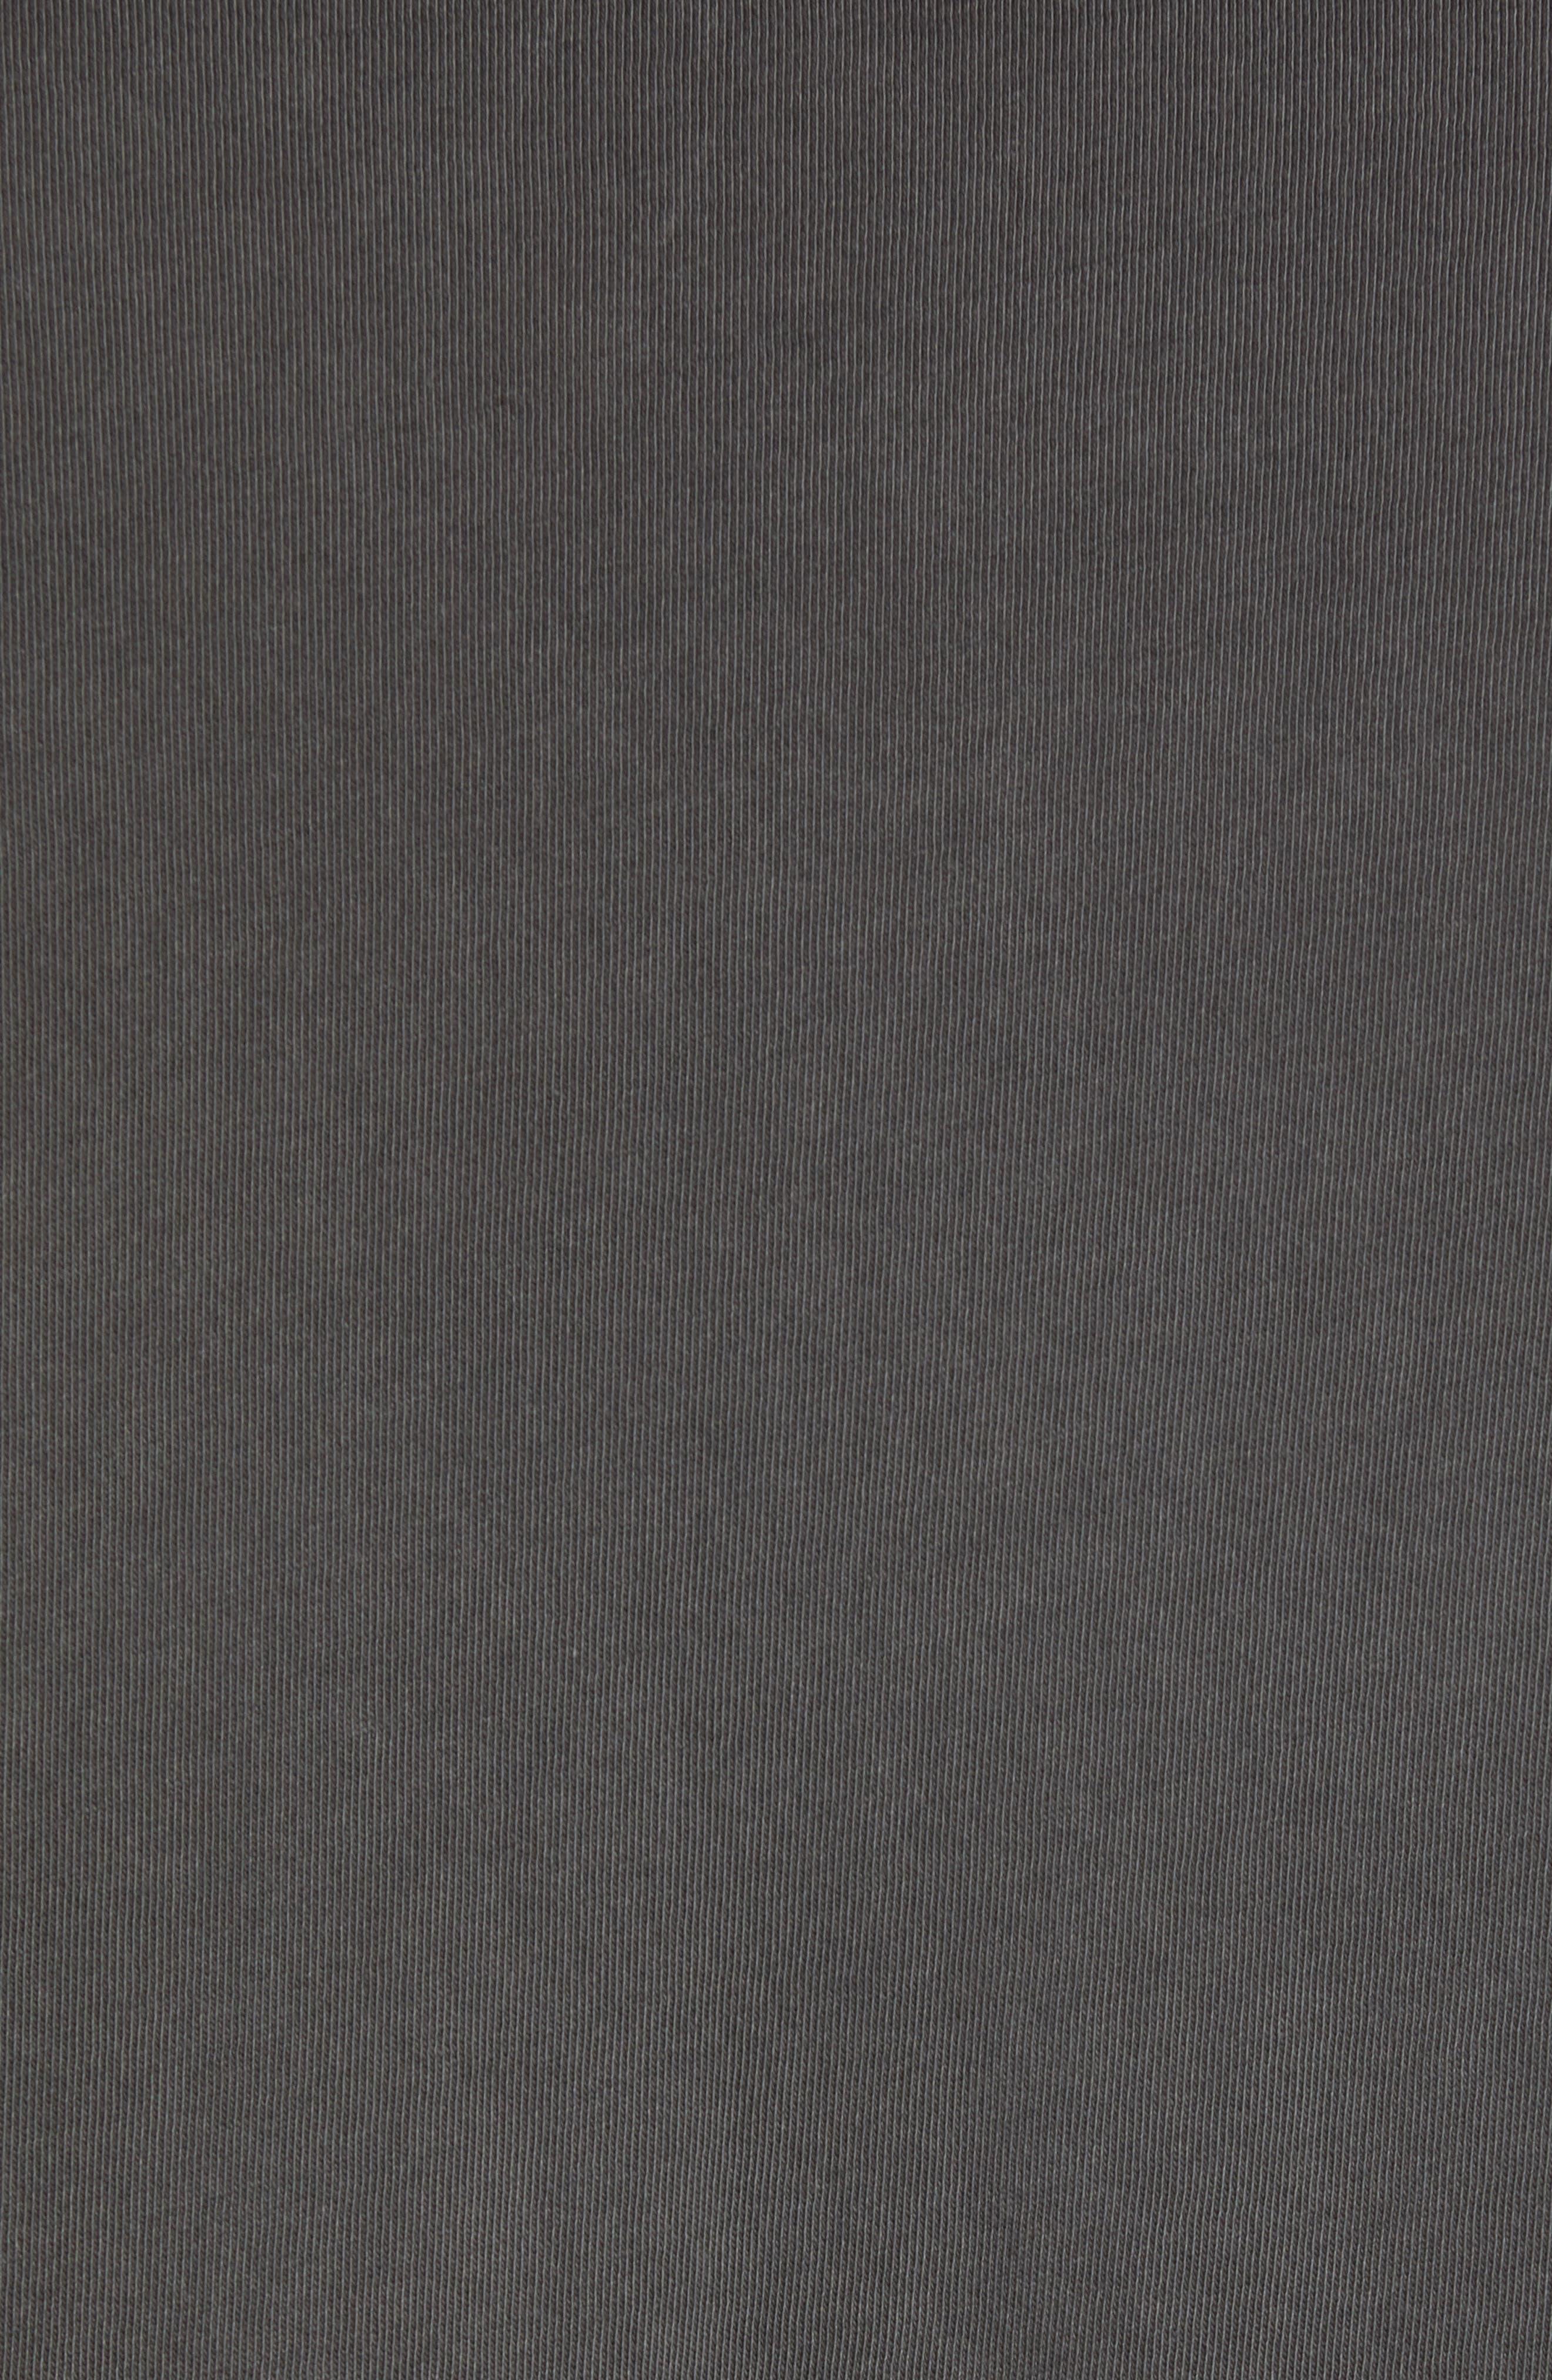 Starkton Solid V-Neck T-Shirt,                             Alternate thumbnail 5, color,                             DARK BLACK